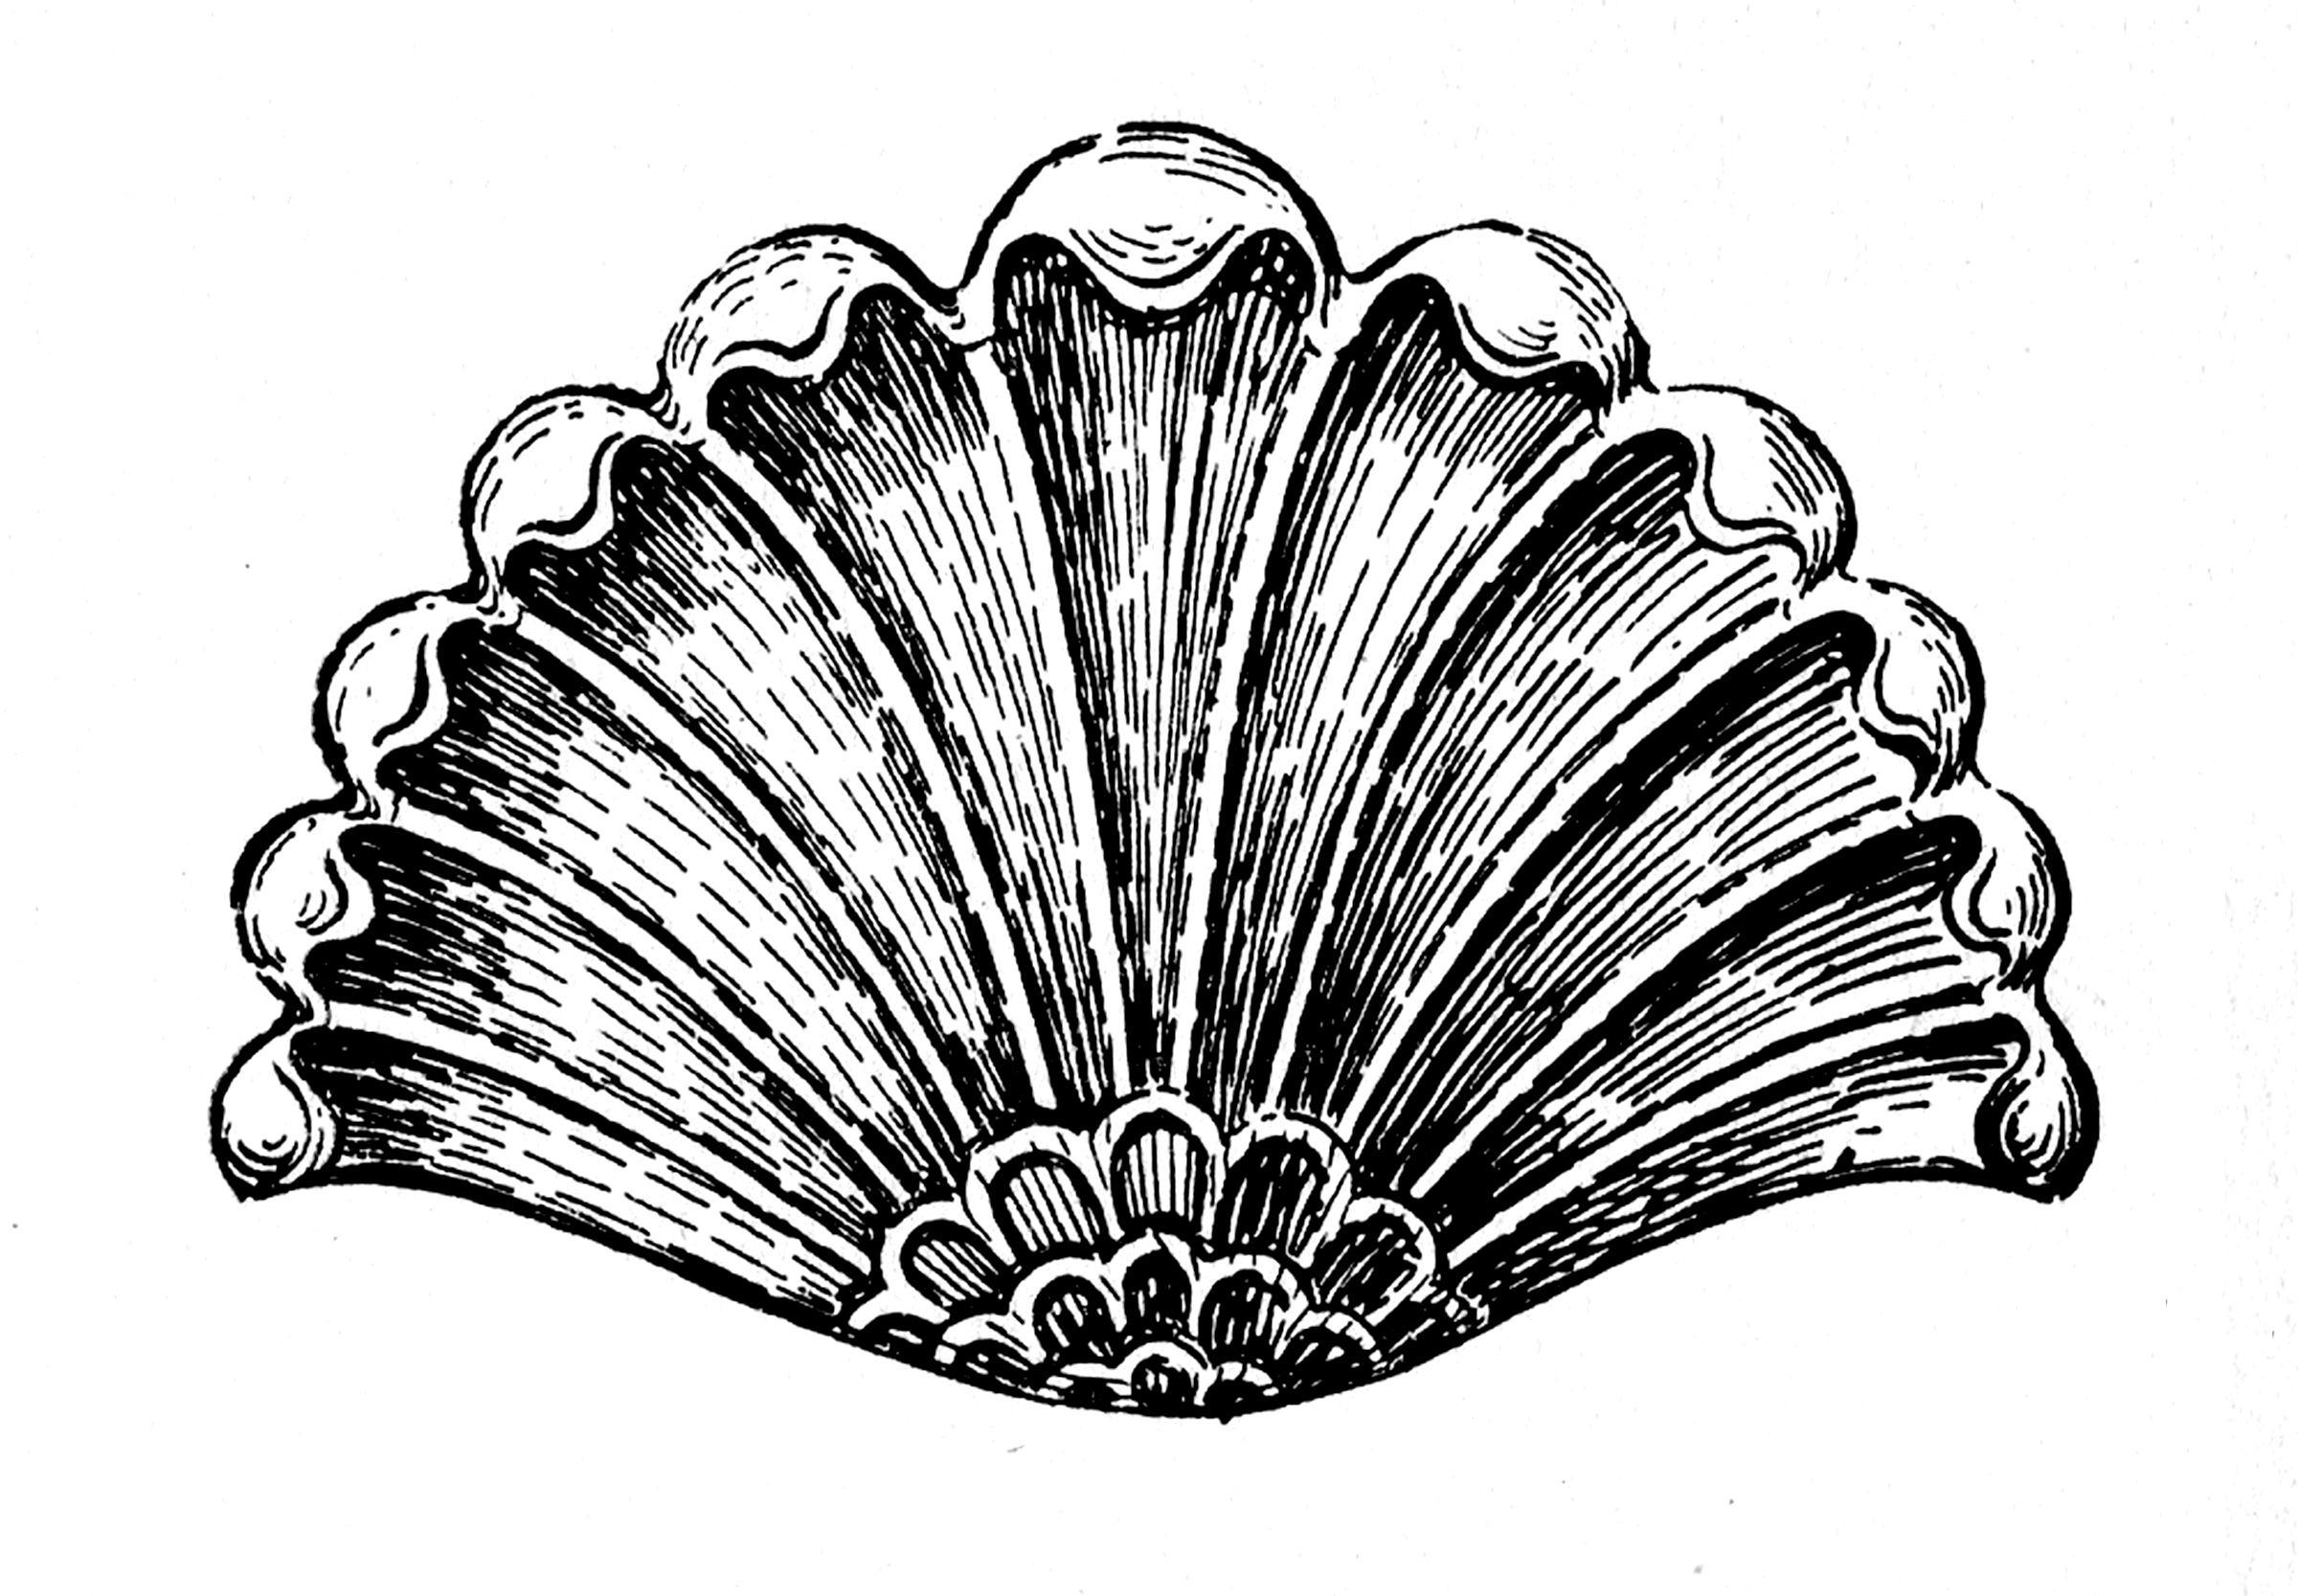 10 Ornamental Shell Clipart Images Clip Art Pictures Vintage Graphics Vintage Illustration